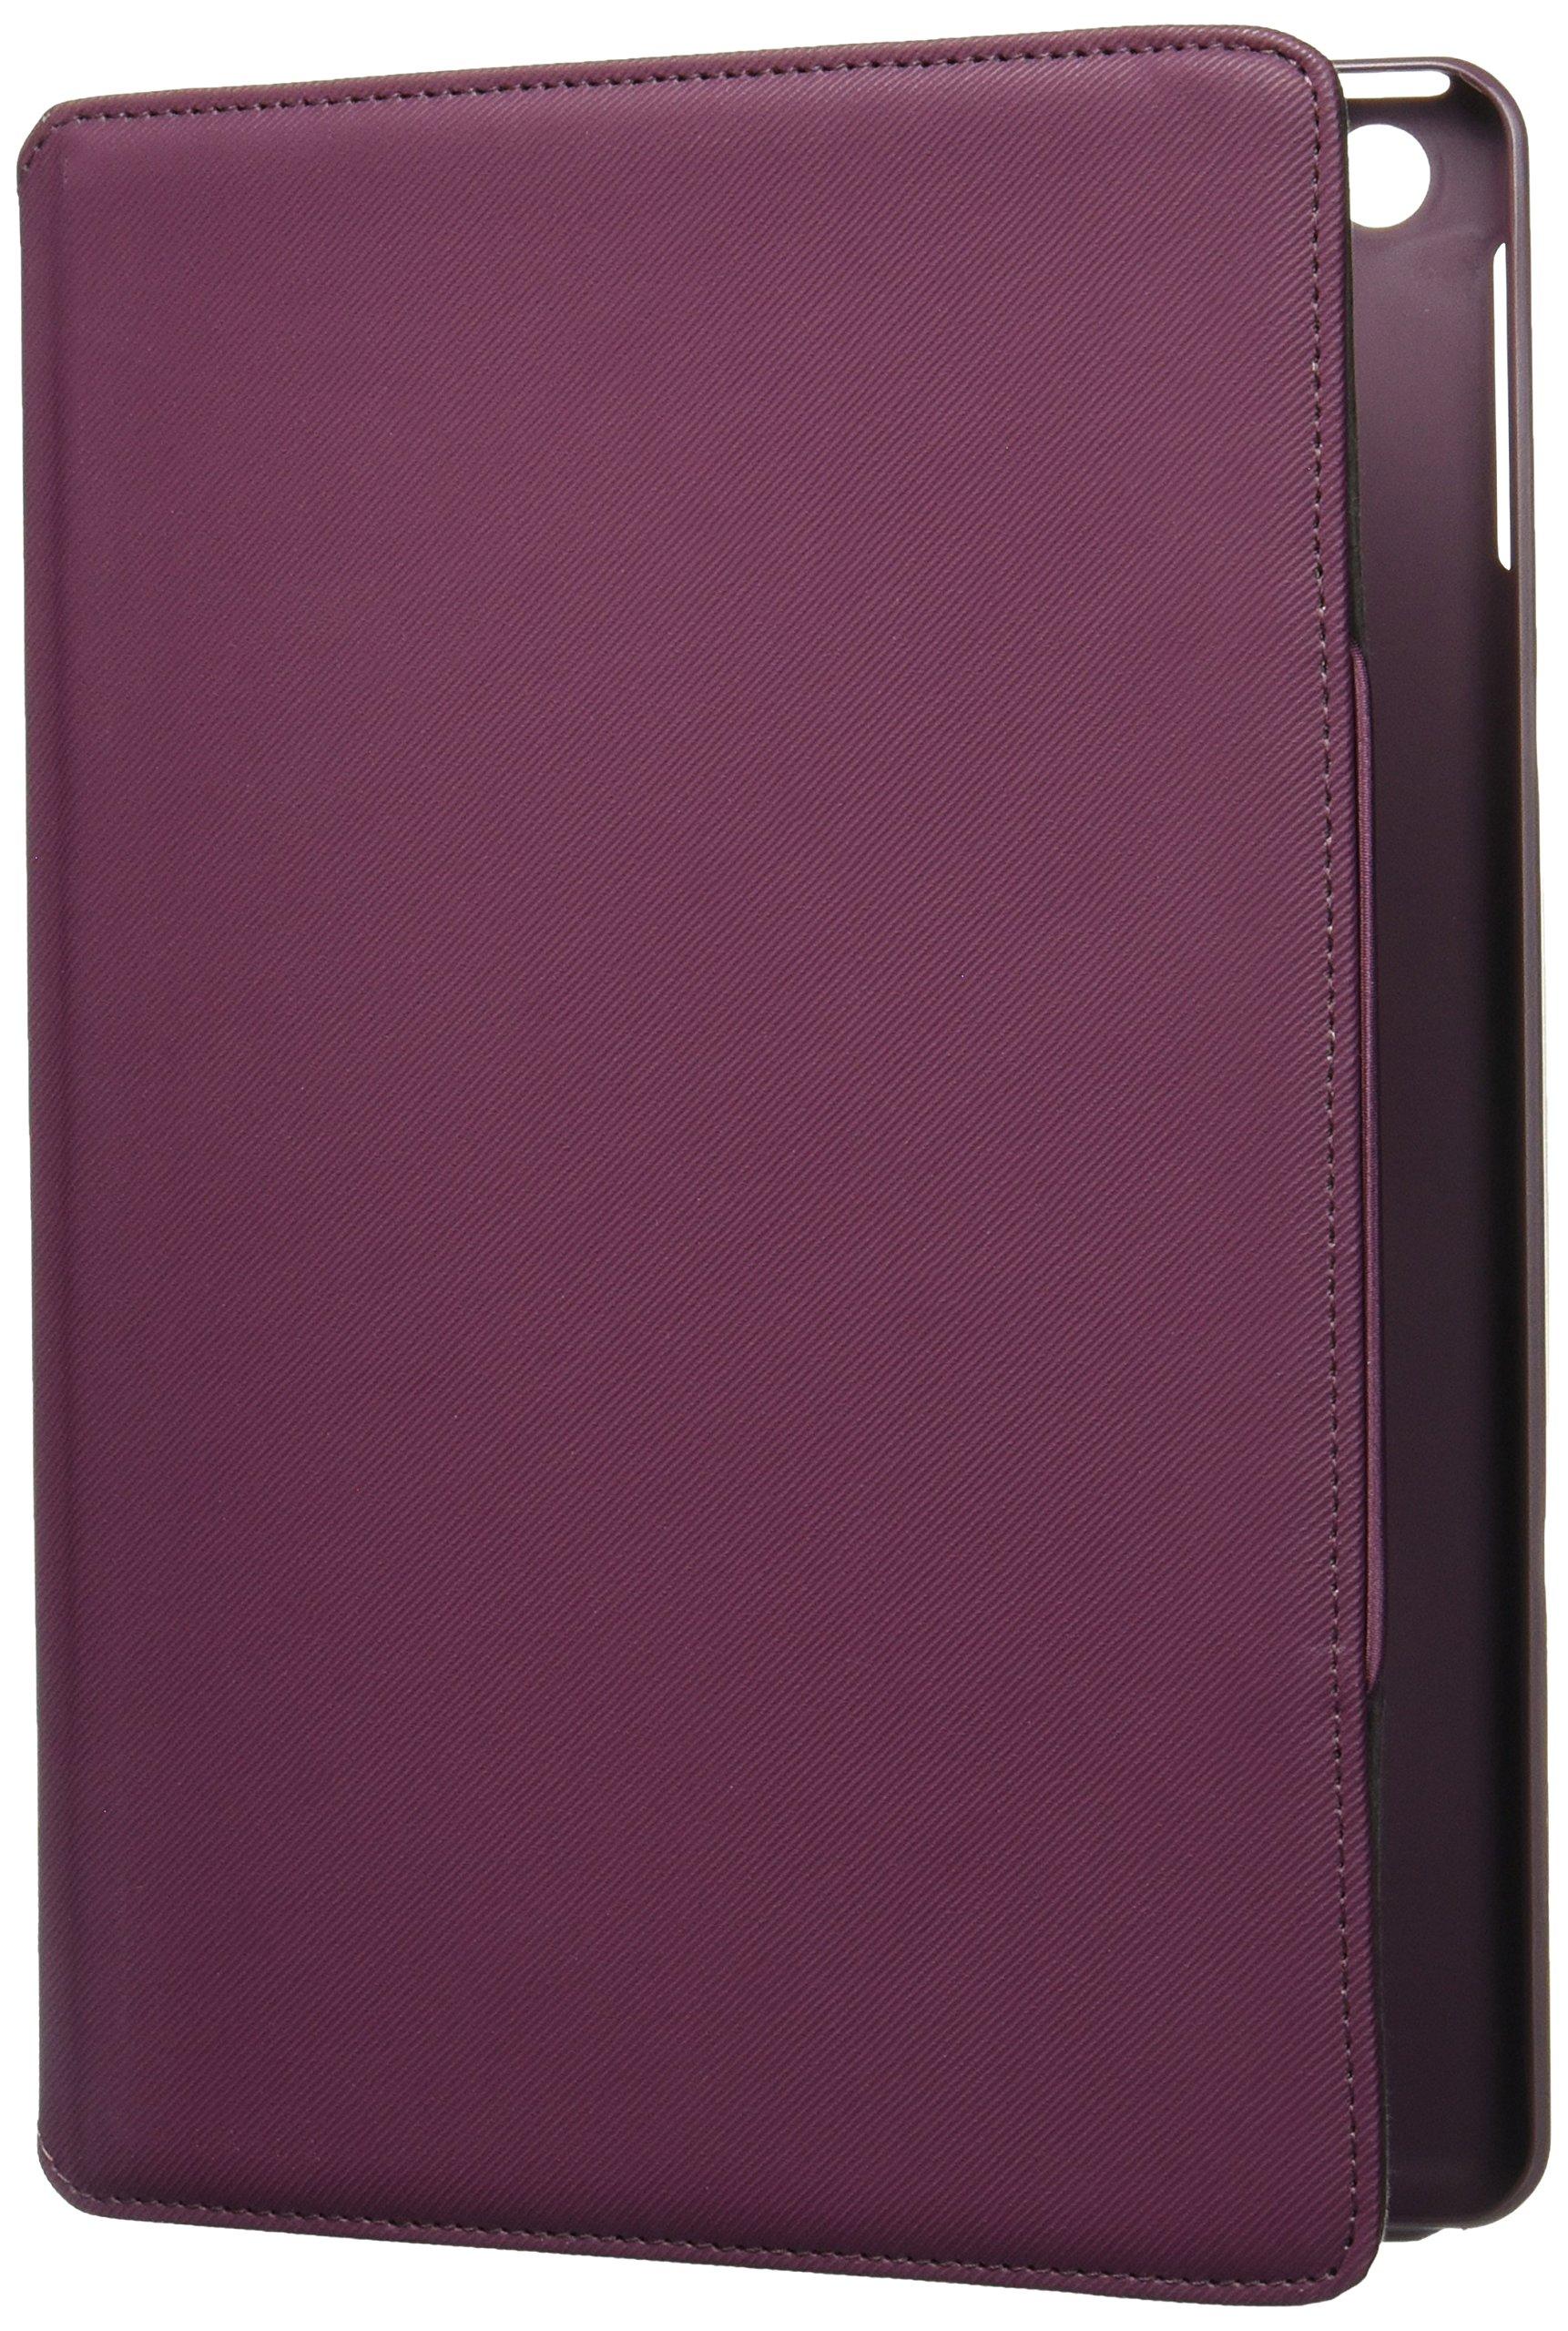 Targus Versavu Rotating Case for iPad Air, Black Cherry (THZ19602US), 9.7 inch